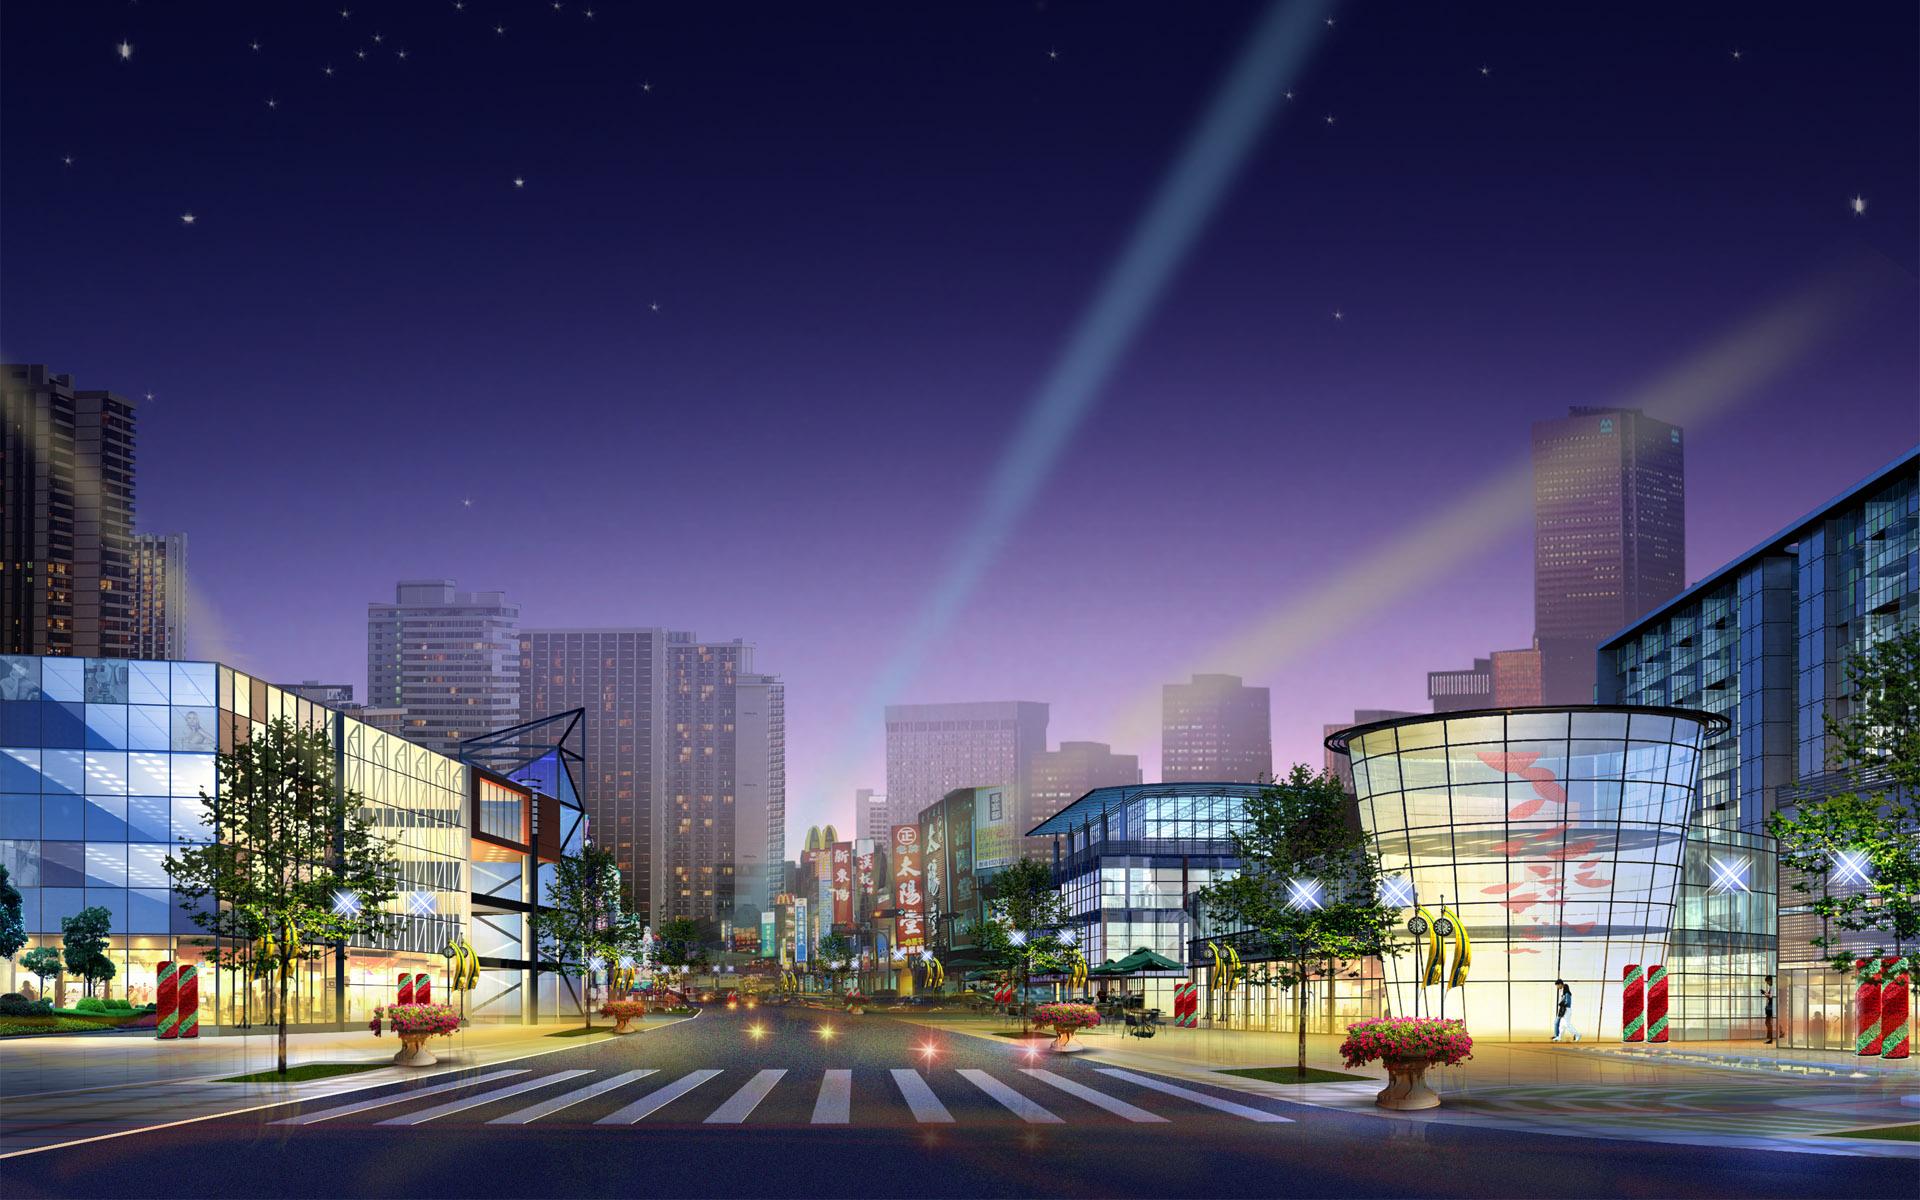 Night City Art Design Concept - Night City Art Design Concept